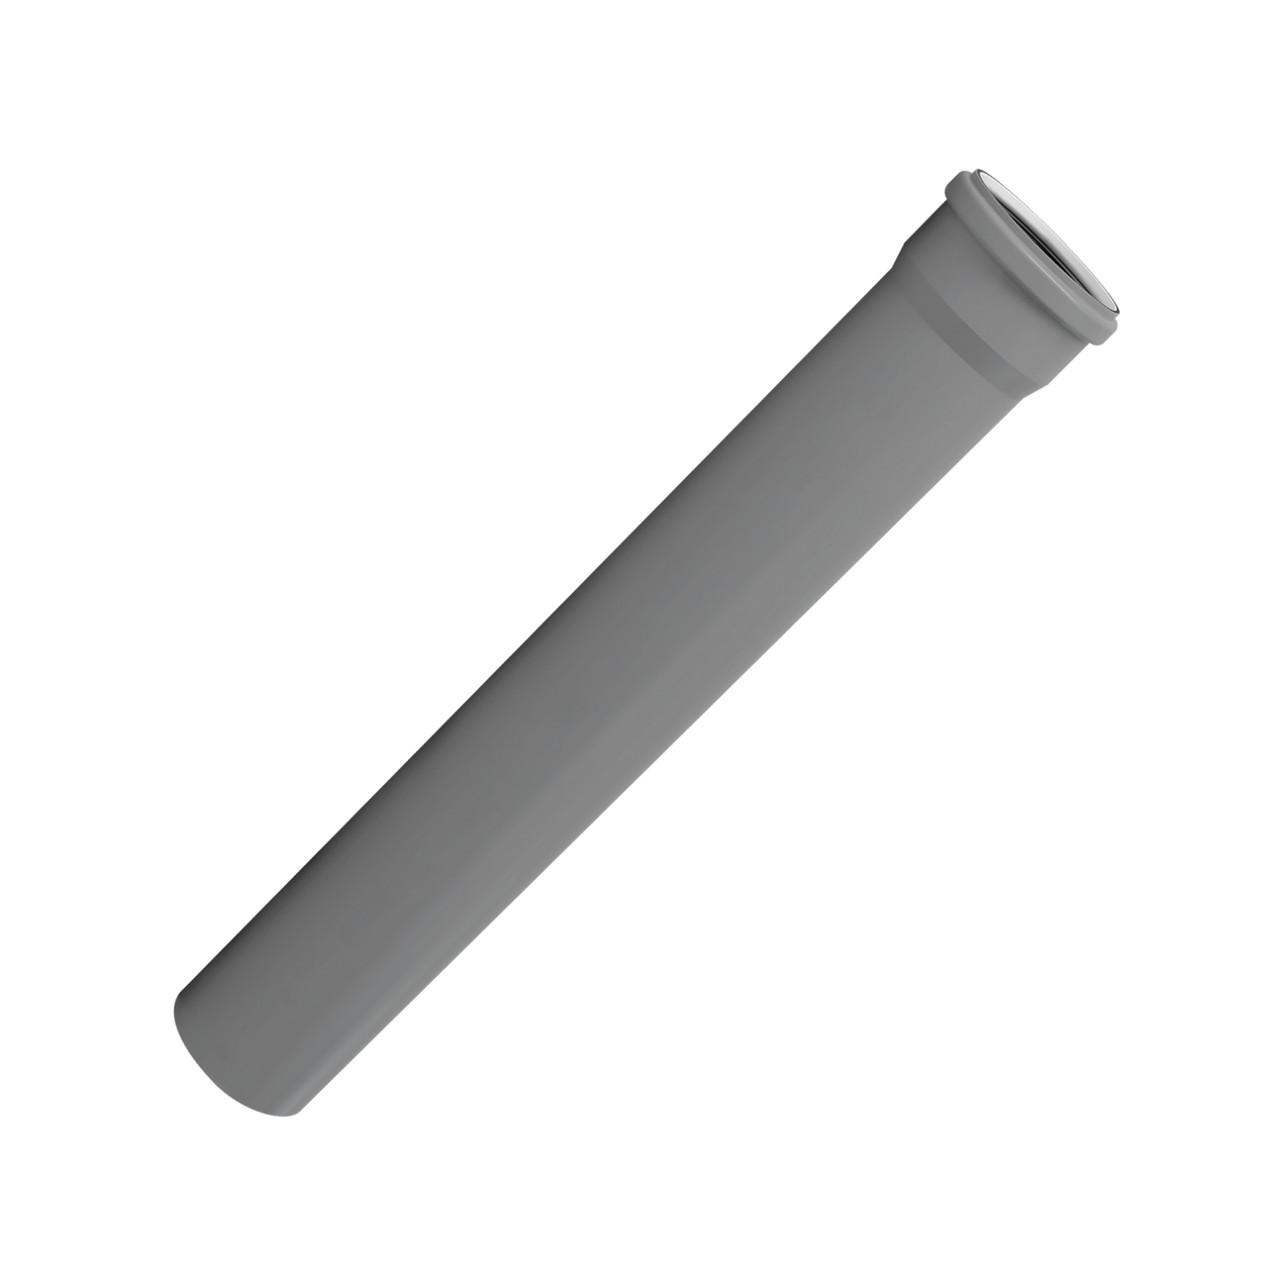 Труба с раструбом VALSIR PP3® Ø110 L=1500 мм 17 dB(A)